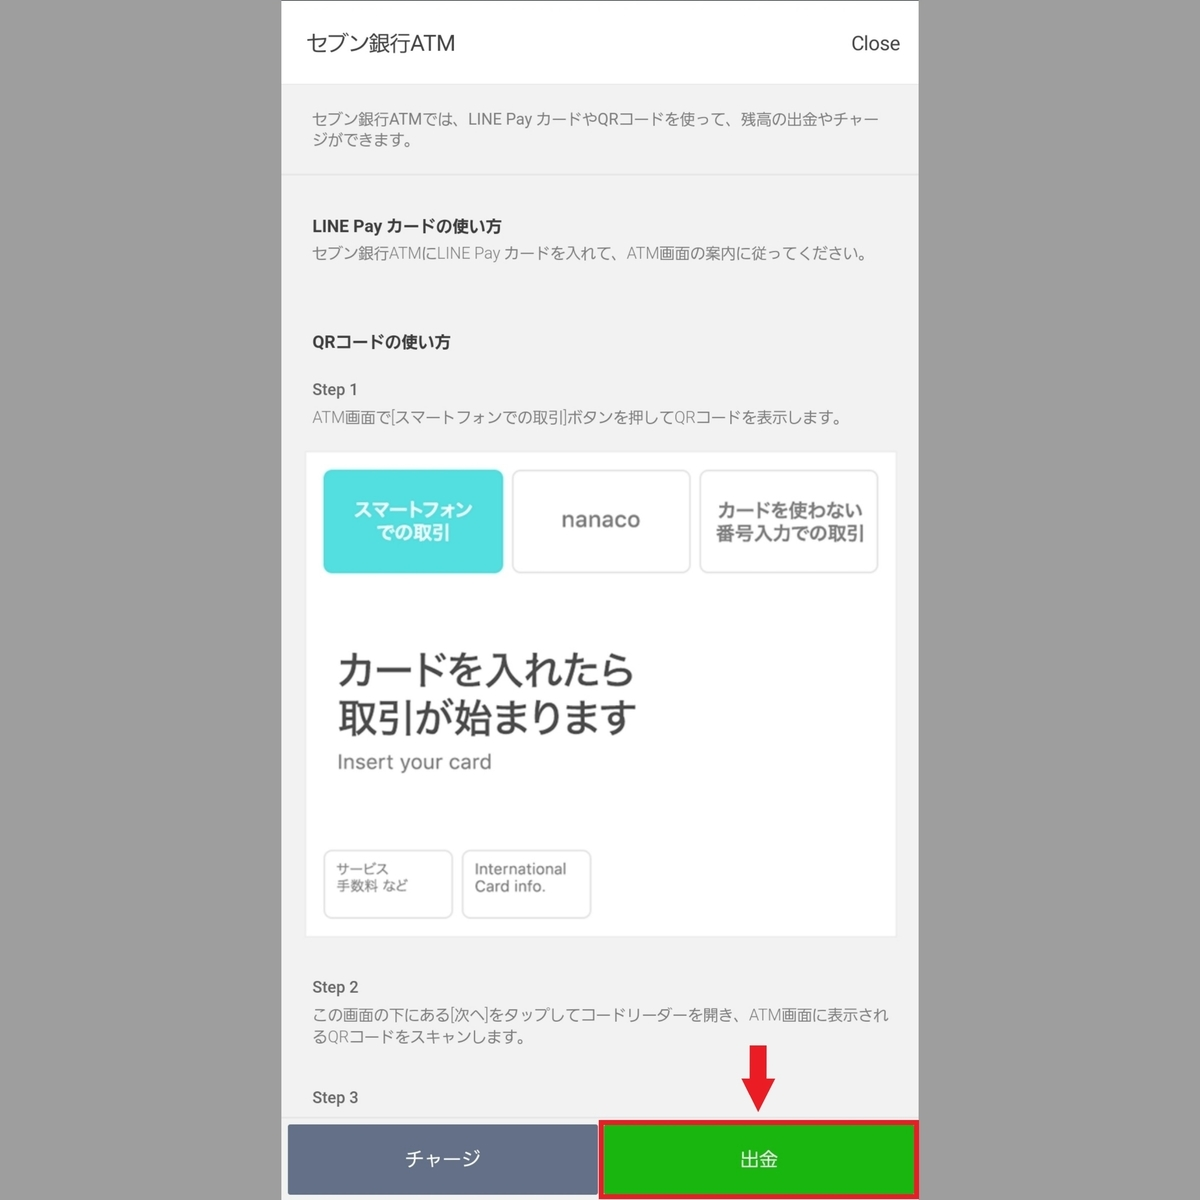 f:id:hihowru:20200322194911j:plain